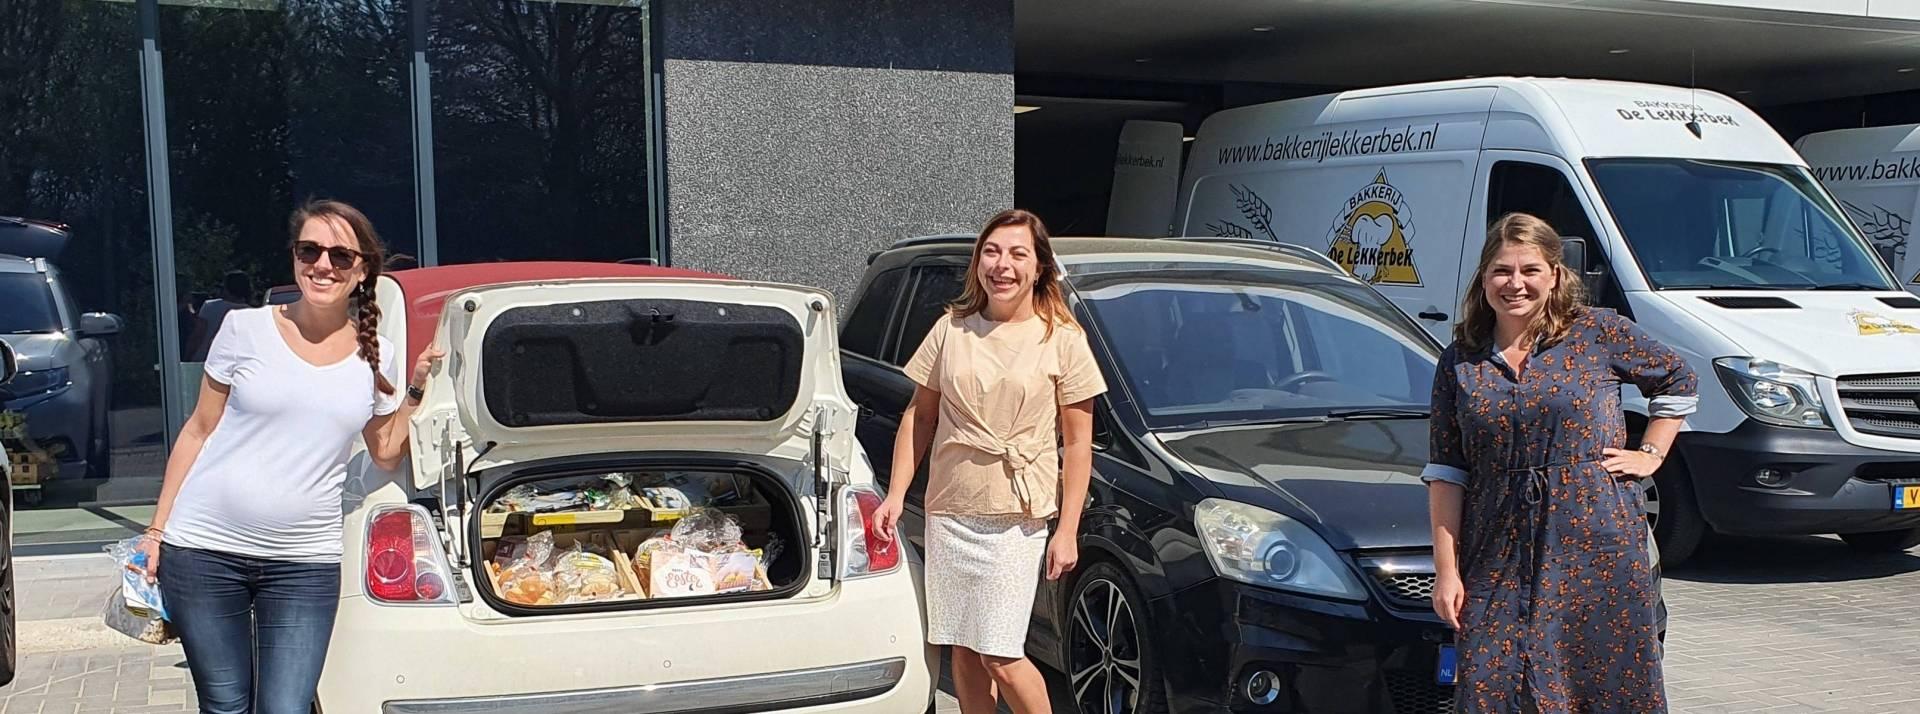 XONAR medewerkers  brengen paaspakketten rond